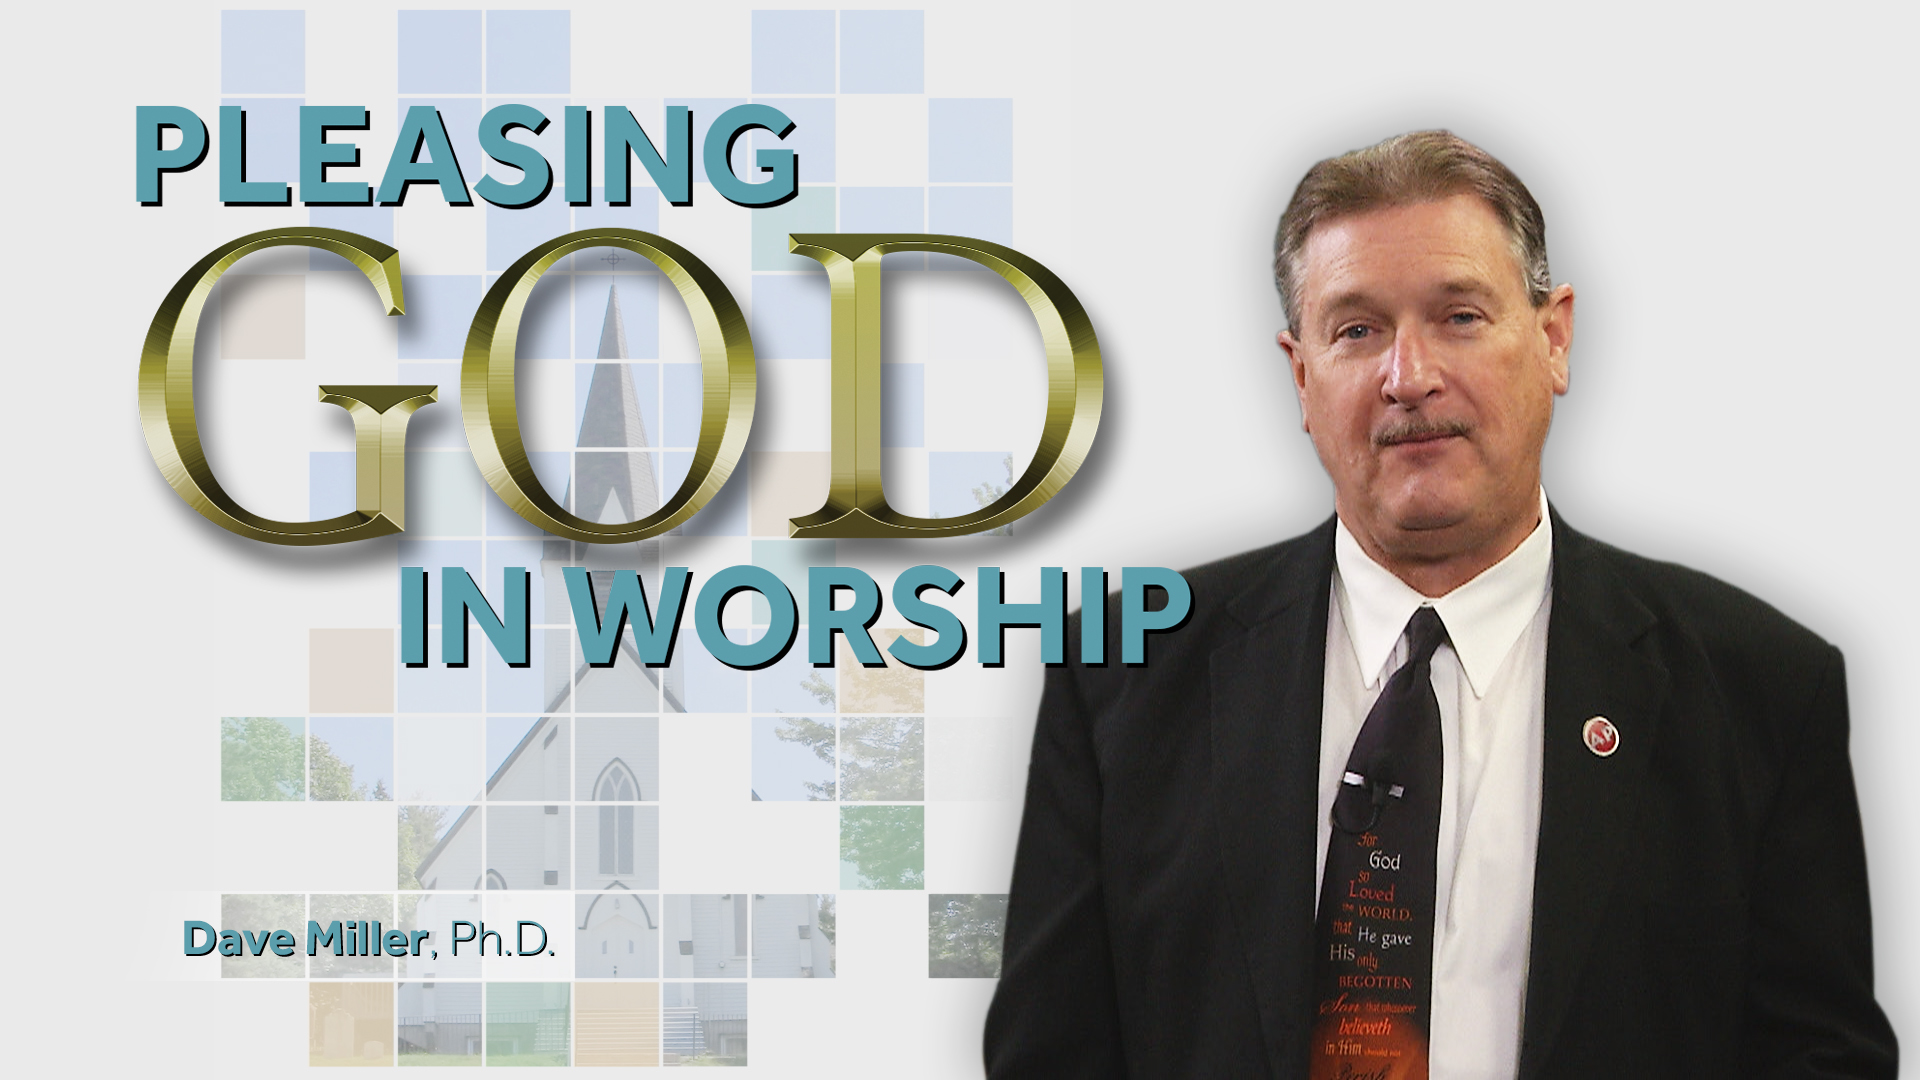 Pleasing God in Worship